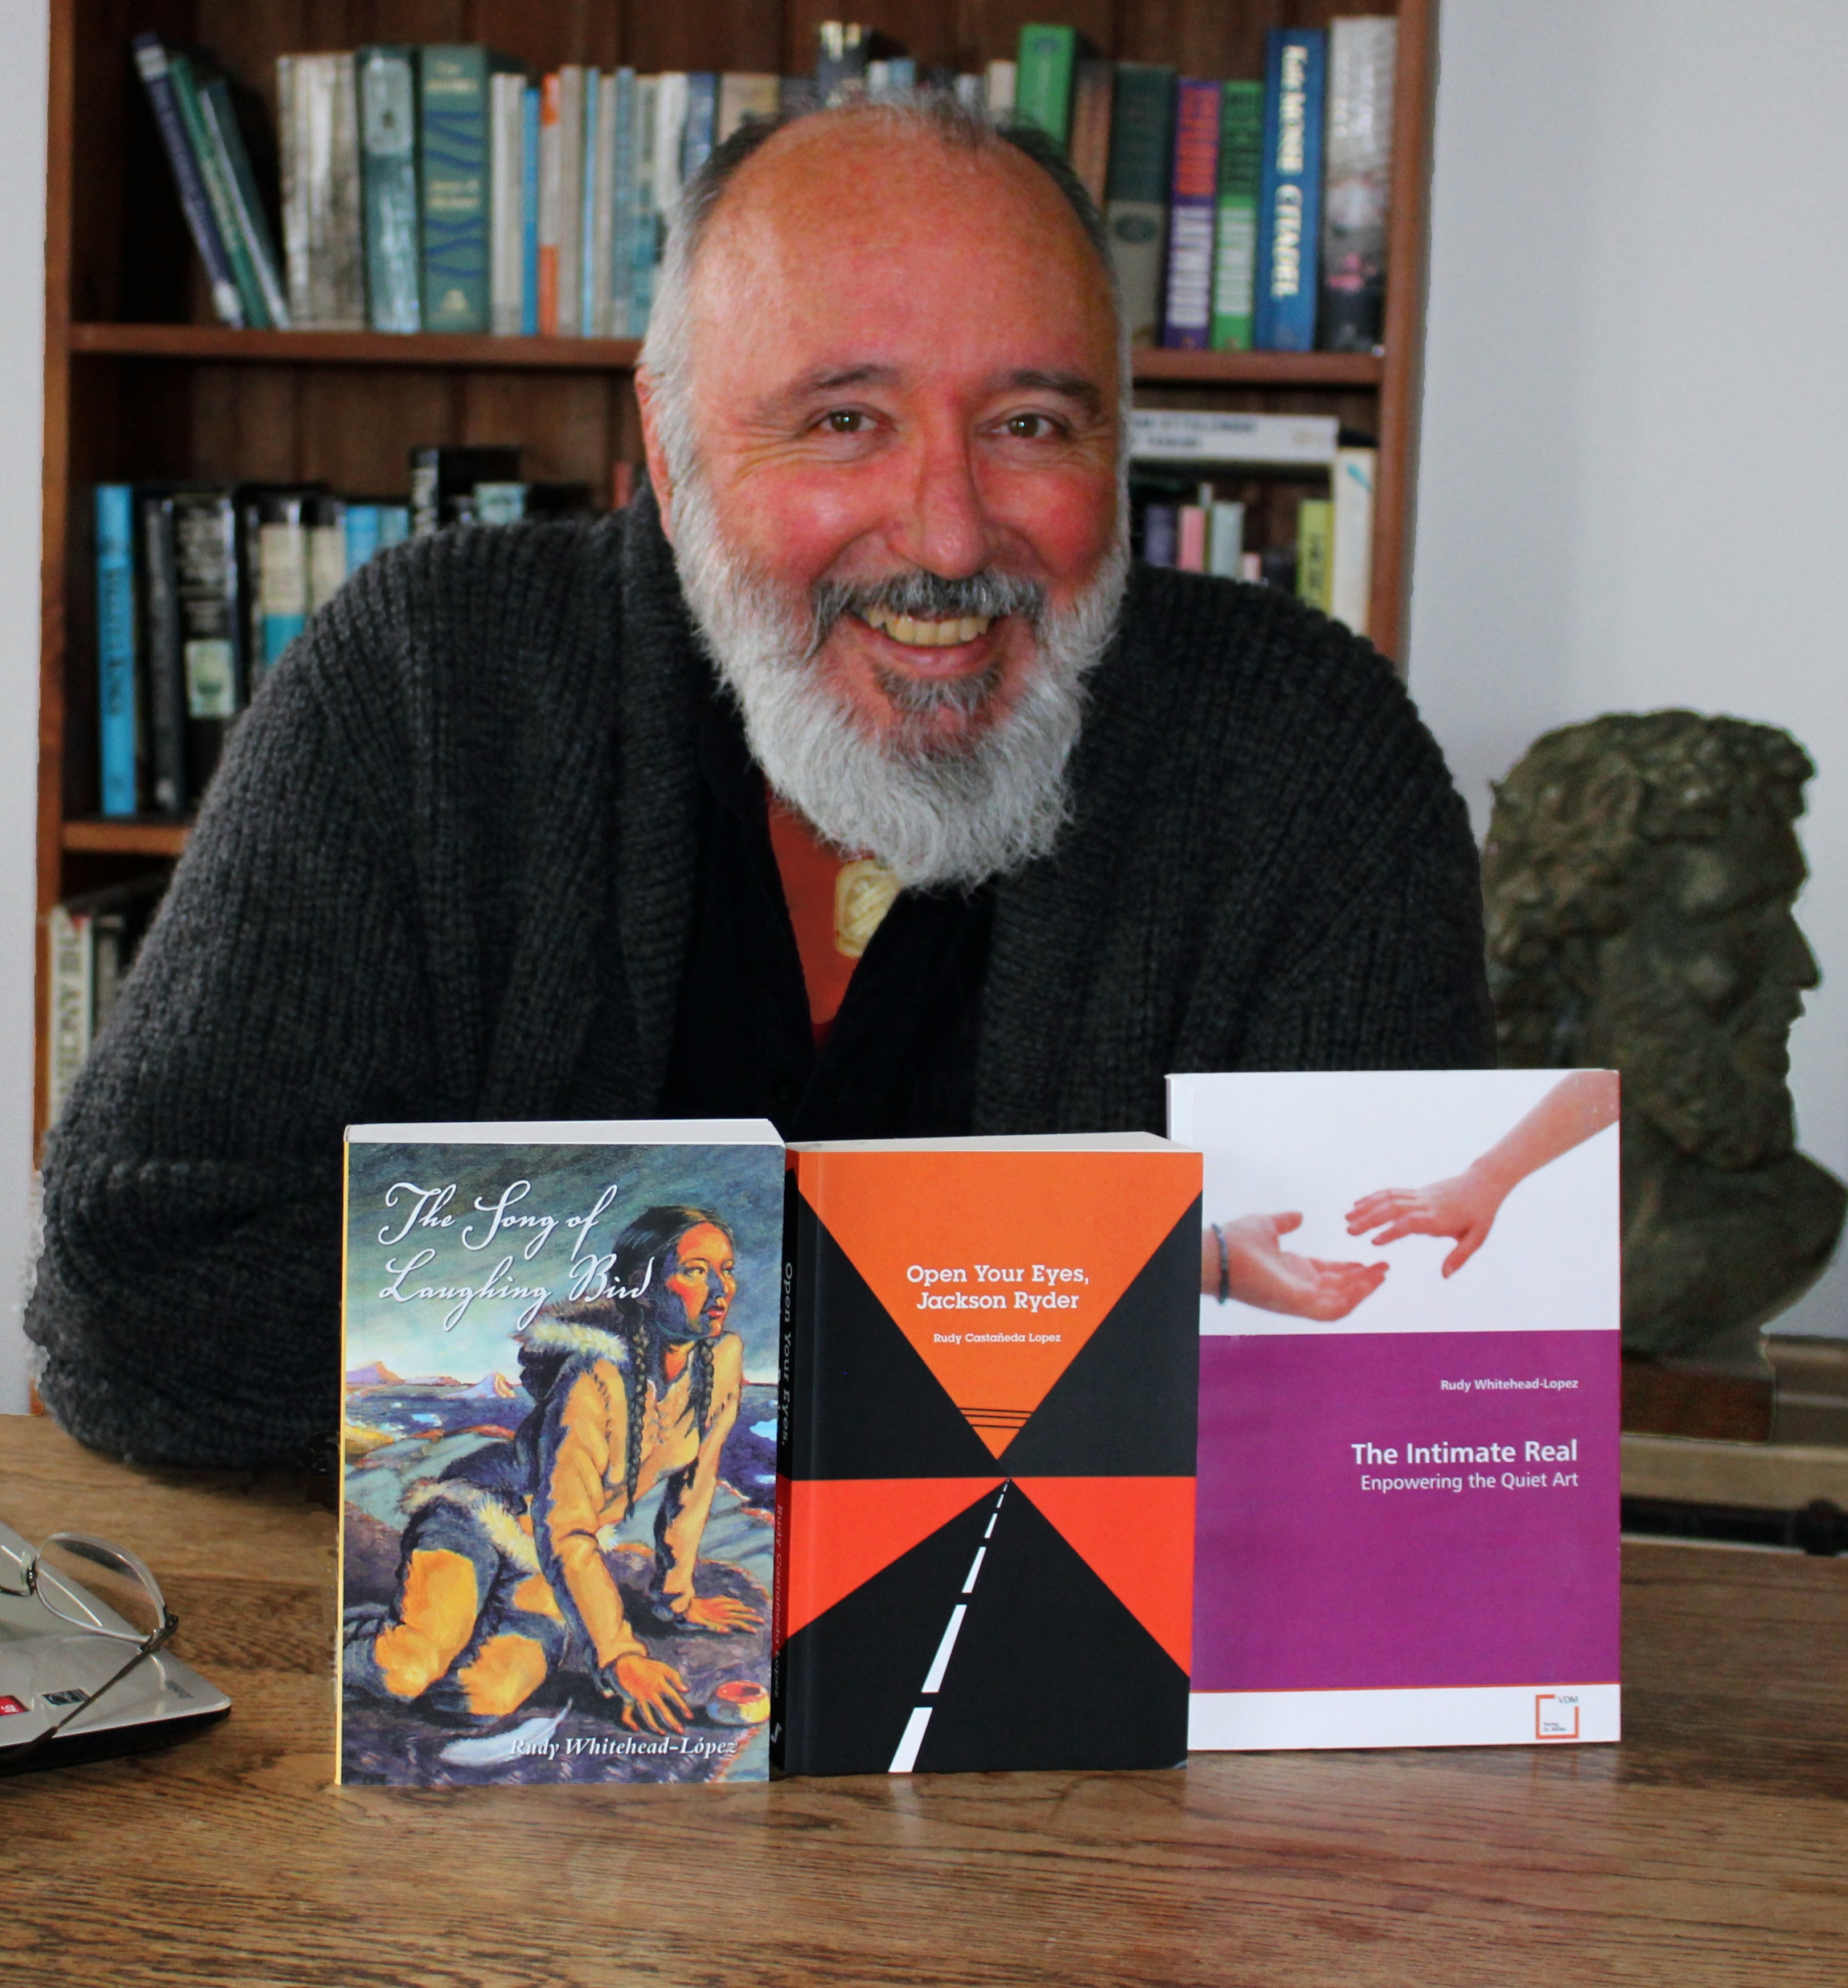 Author Rudy Castañeda López